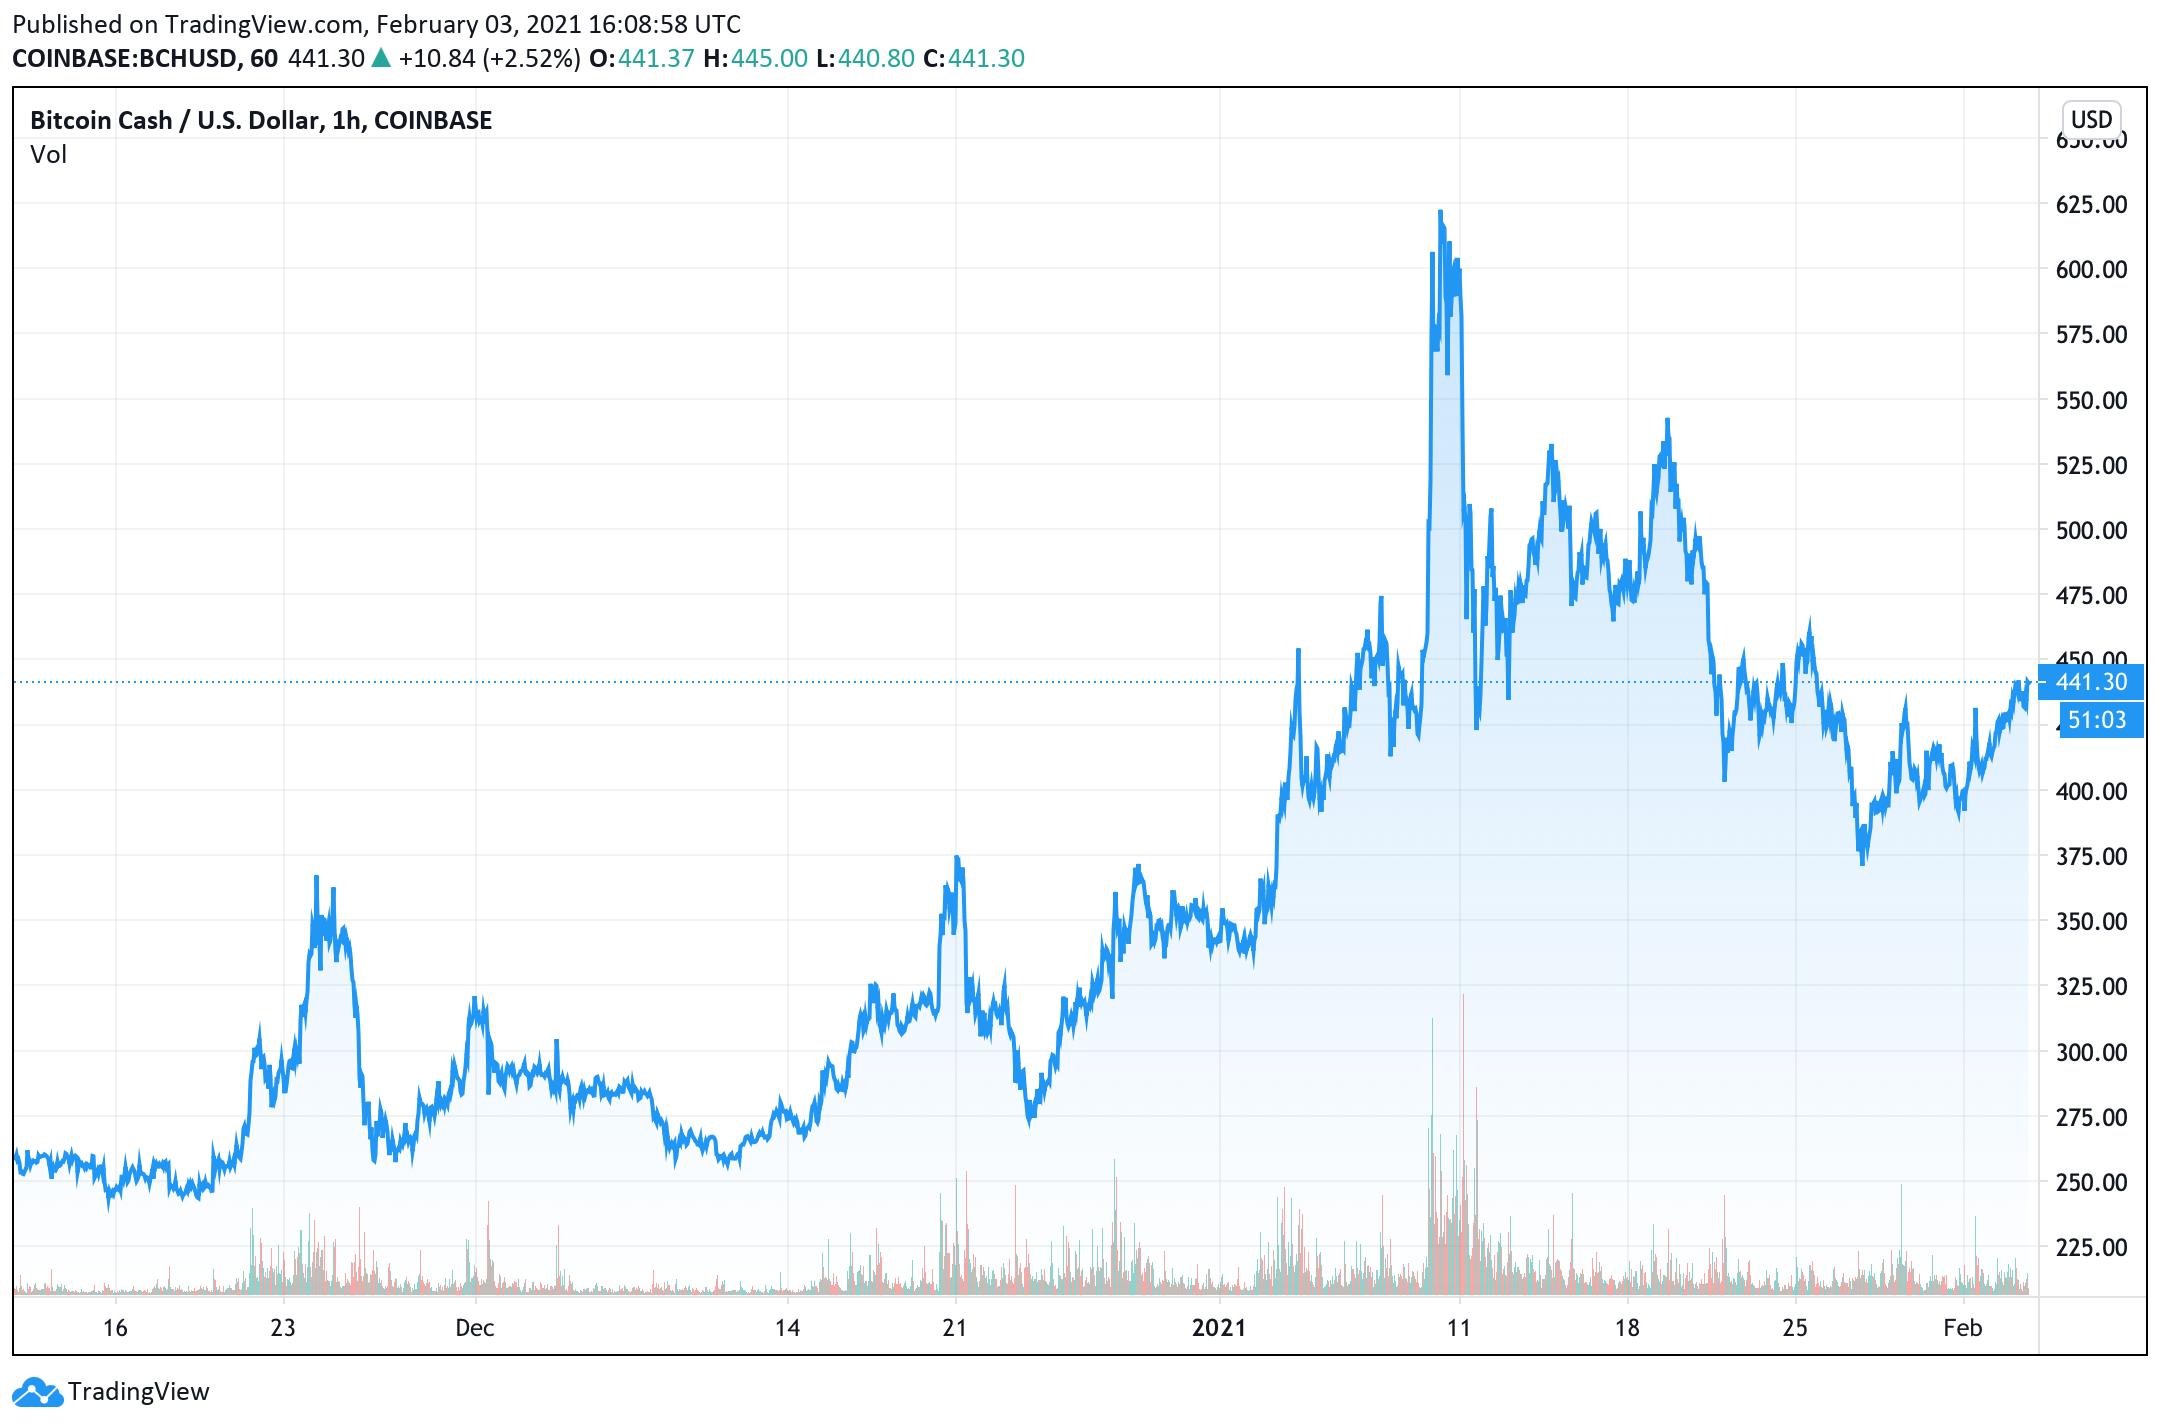 Crypto Markets Surge, ETH Price Rallies, Bitcoin's Tight Range Indicates Big Move Ahead